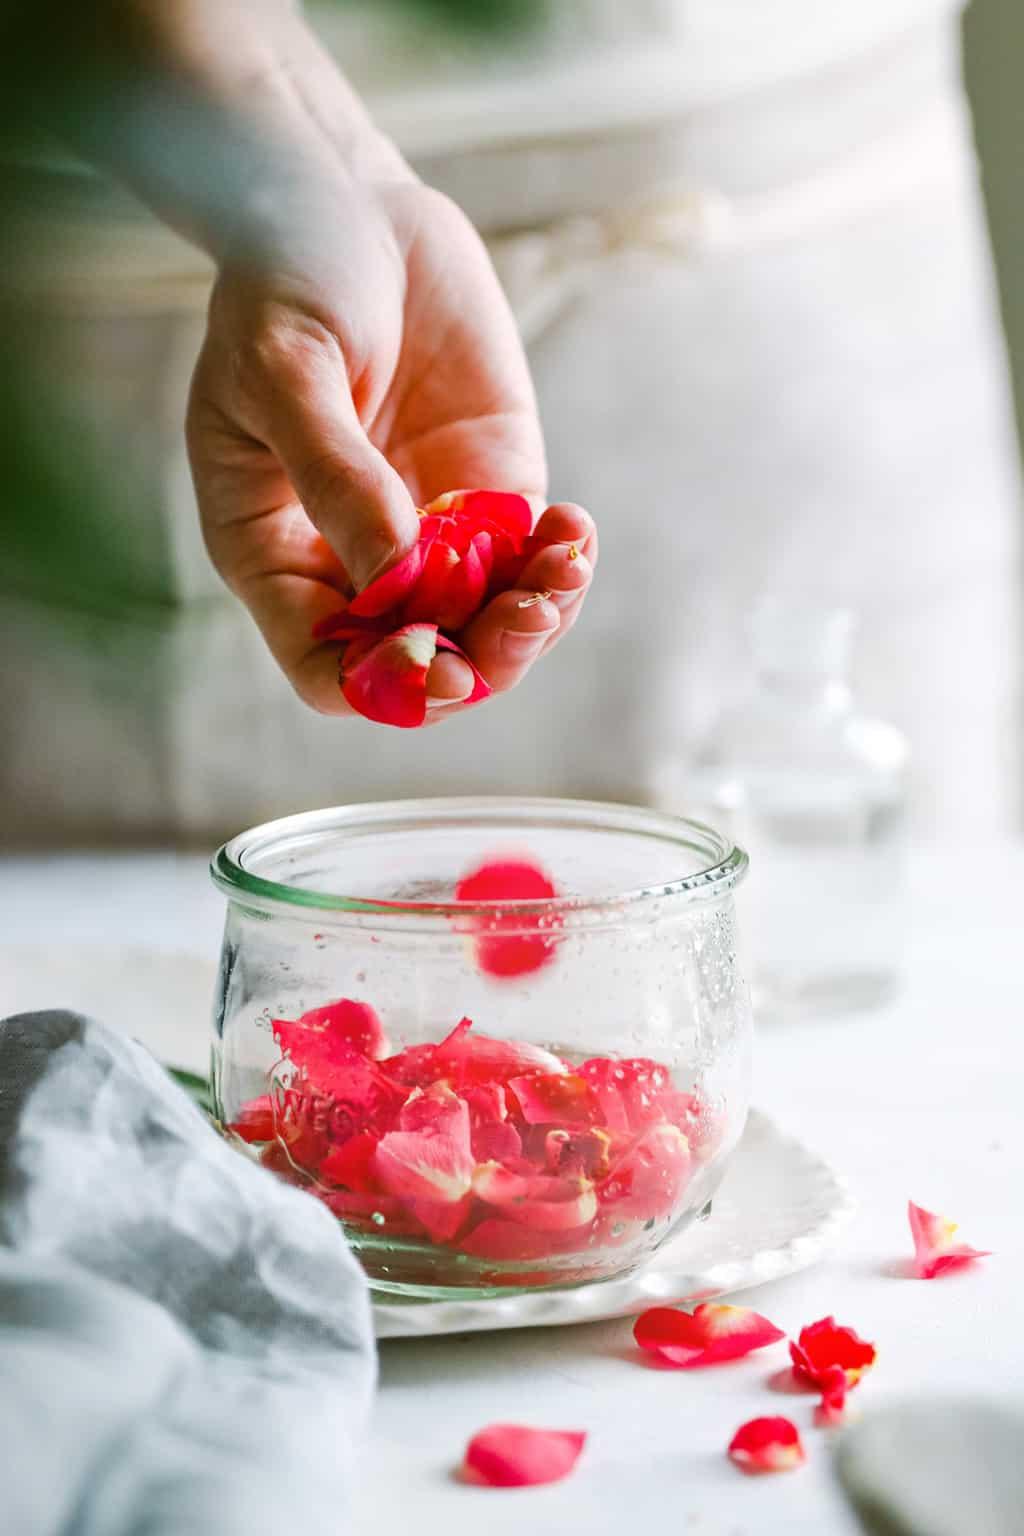 Answering how long will a diy beauty recipe last